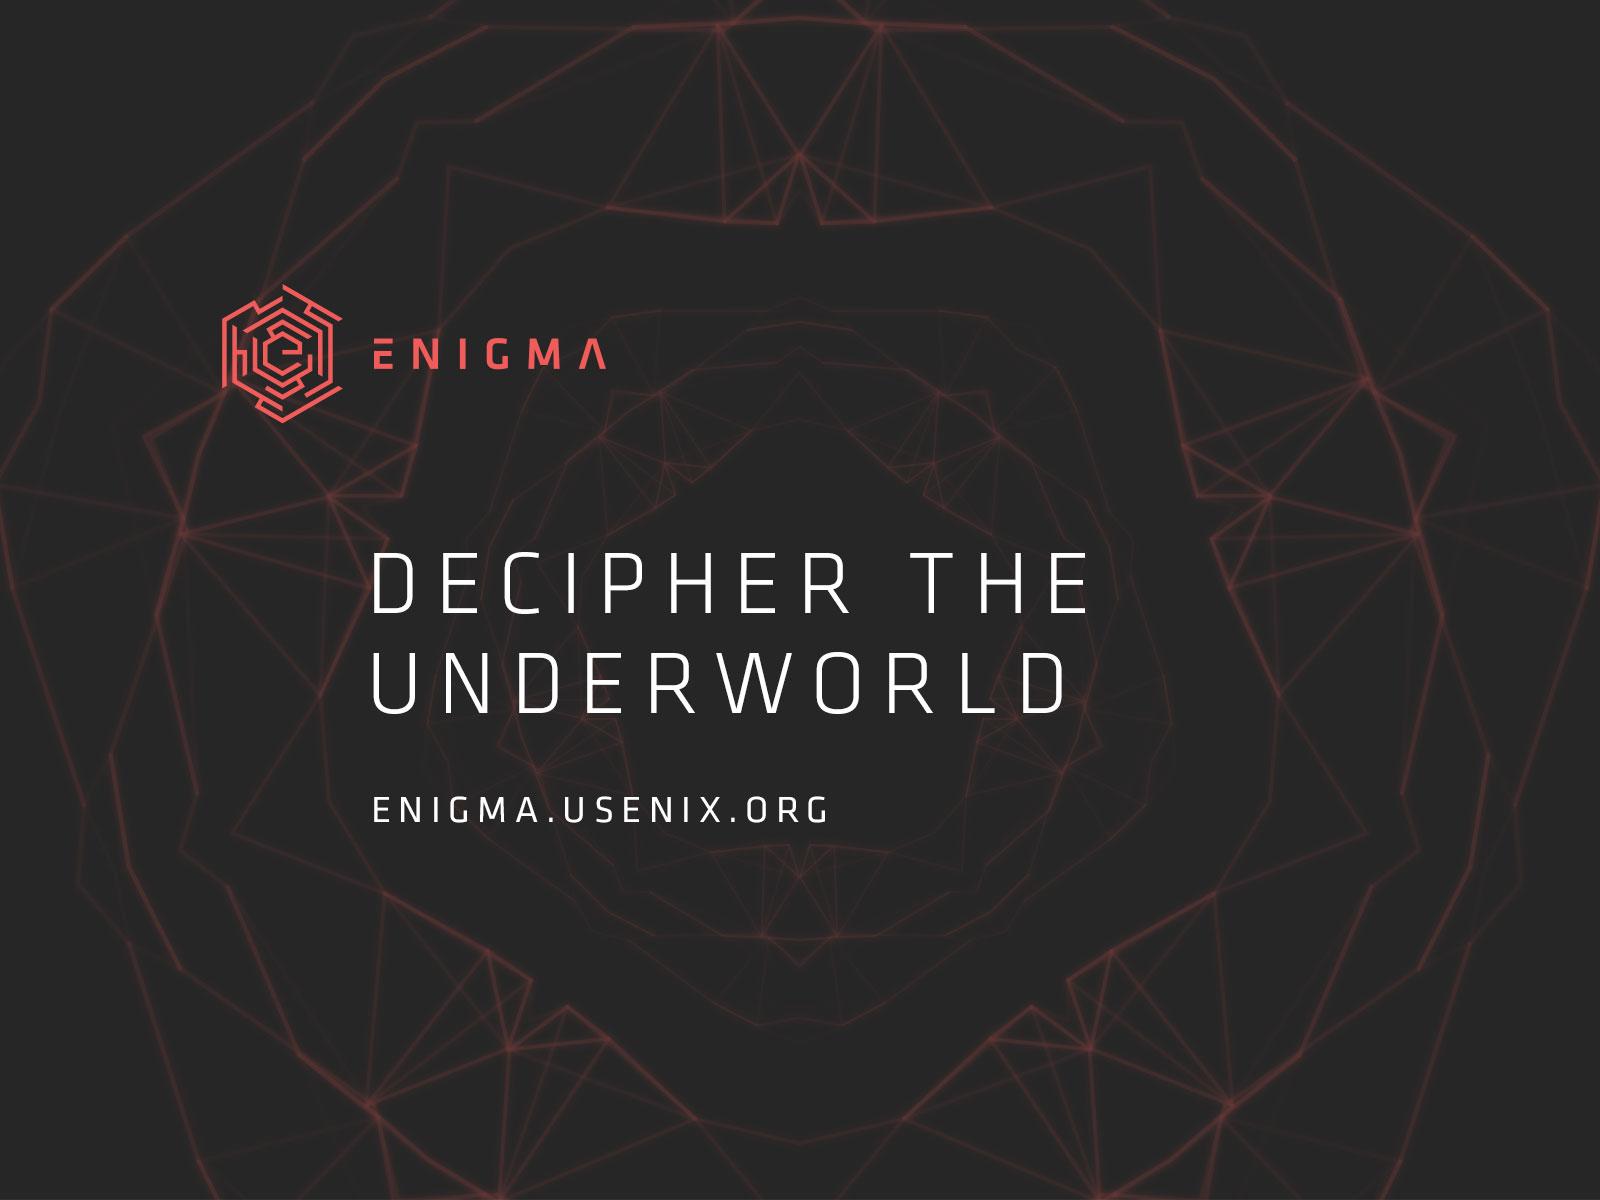 Enigma Conference